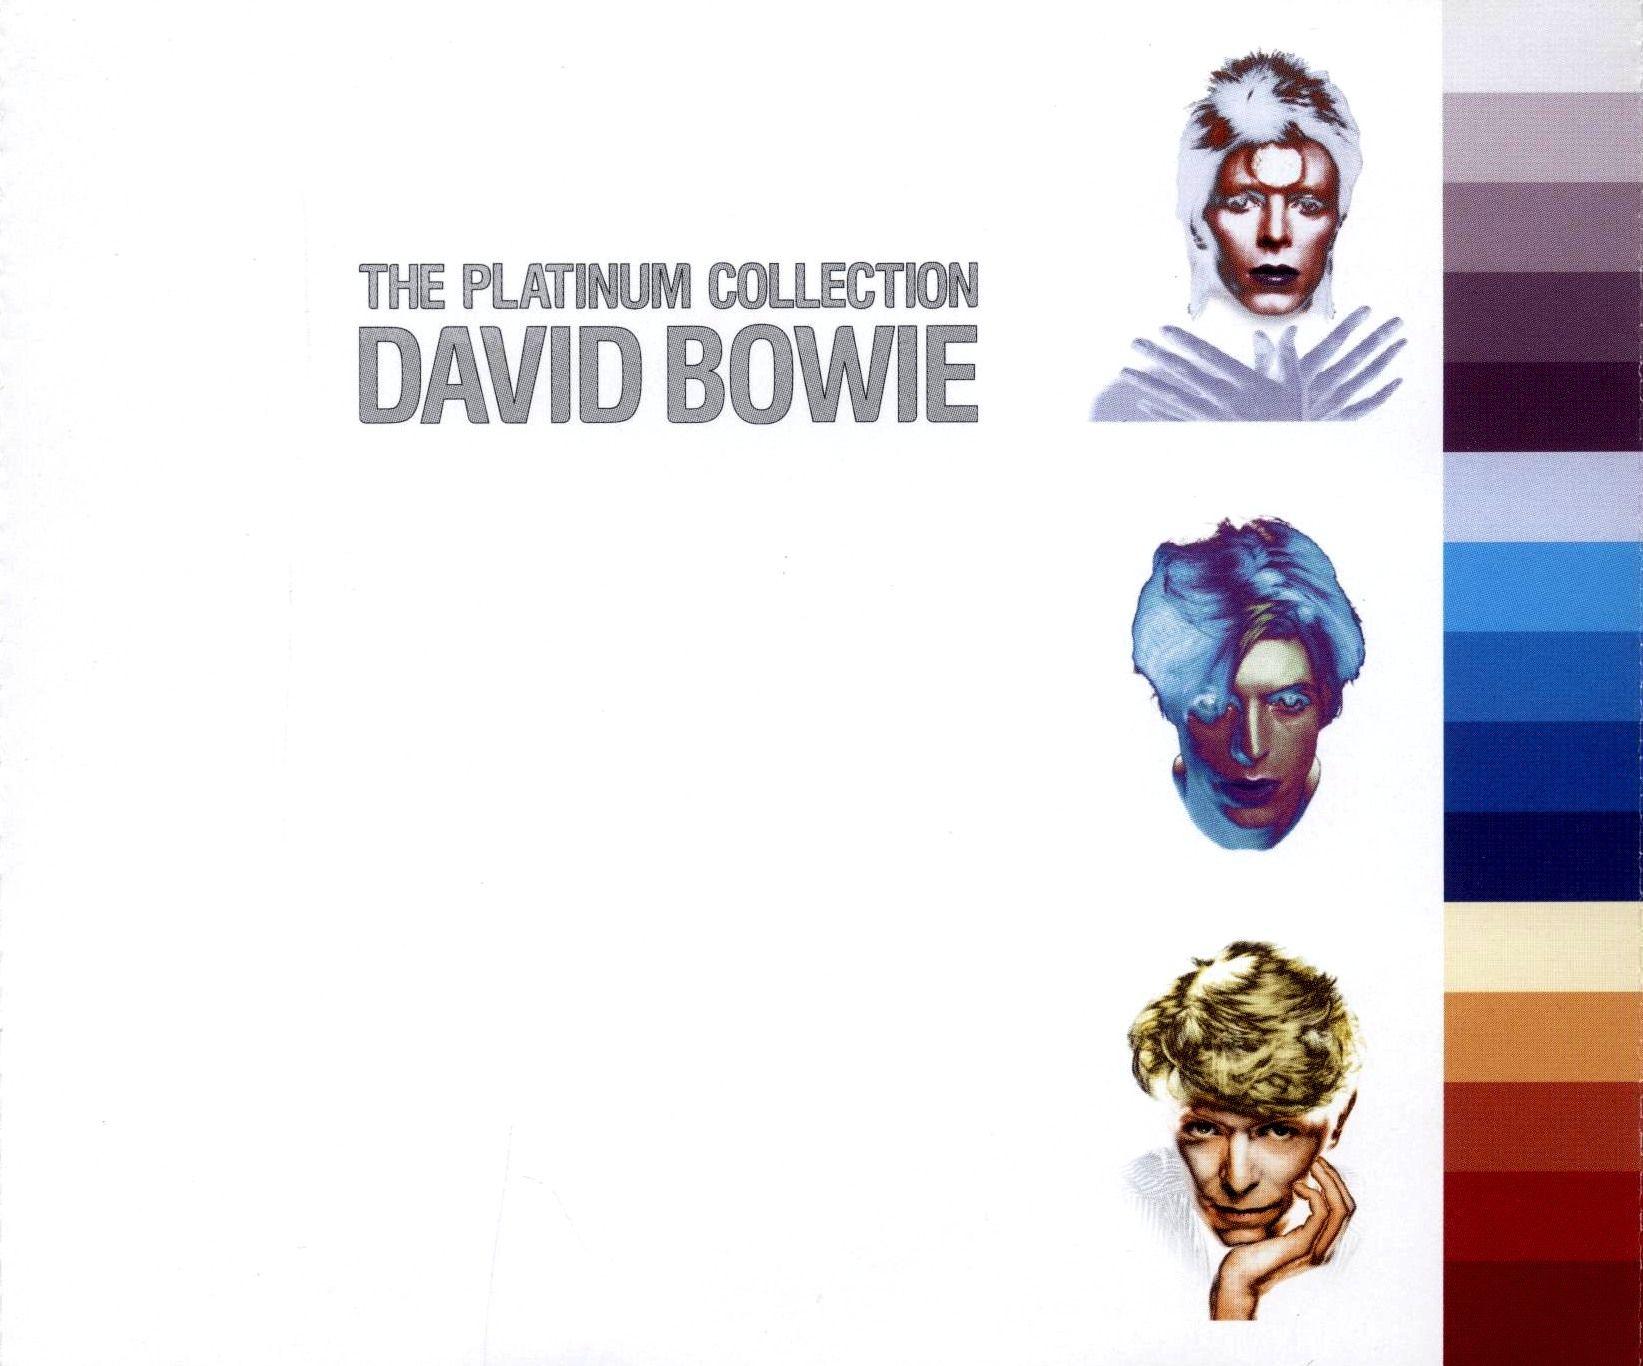 David Bowie - The Platinum Collection album cover